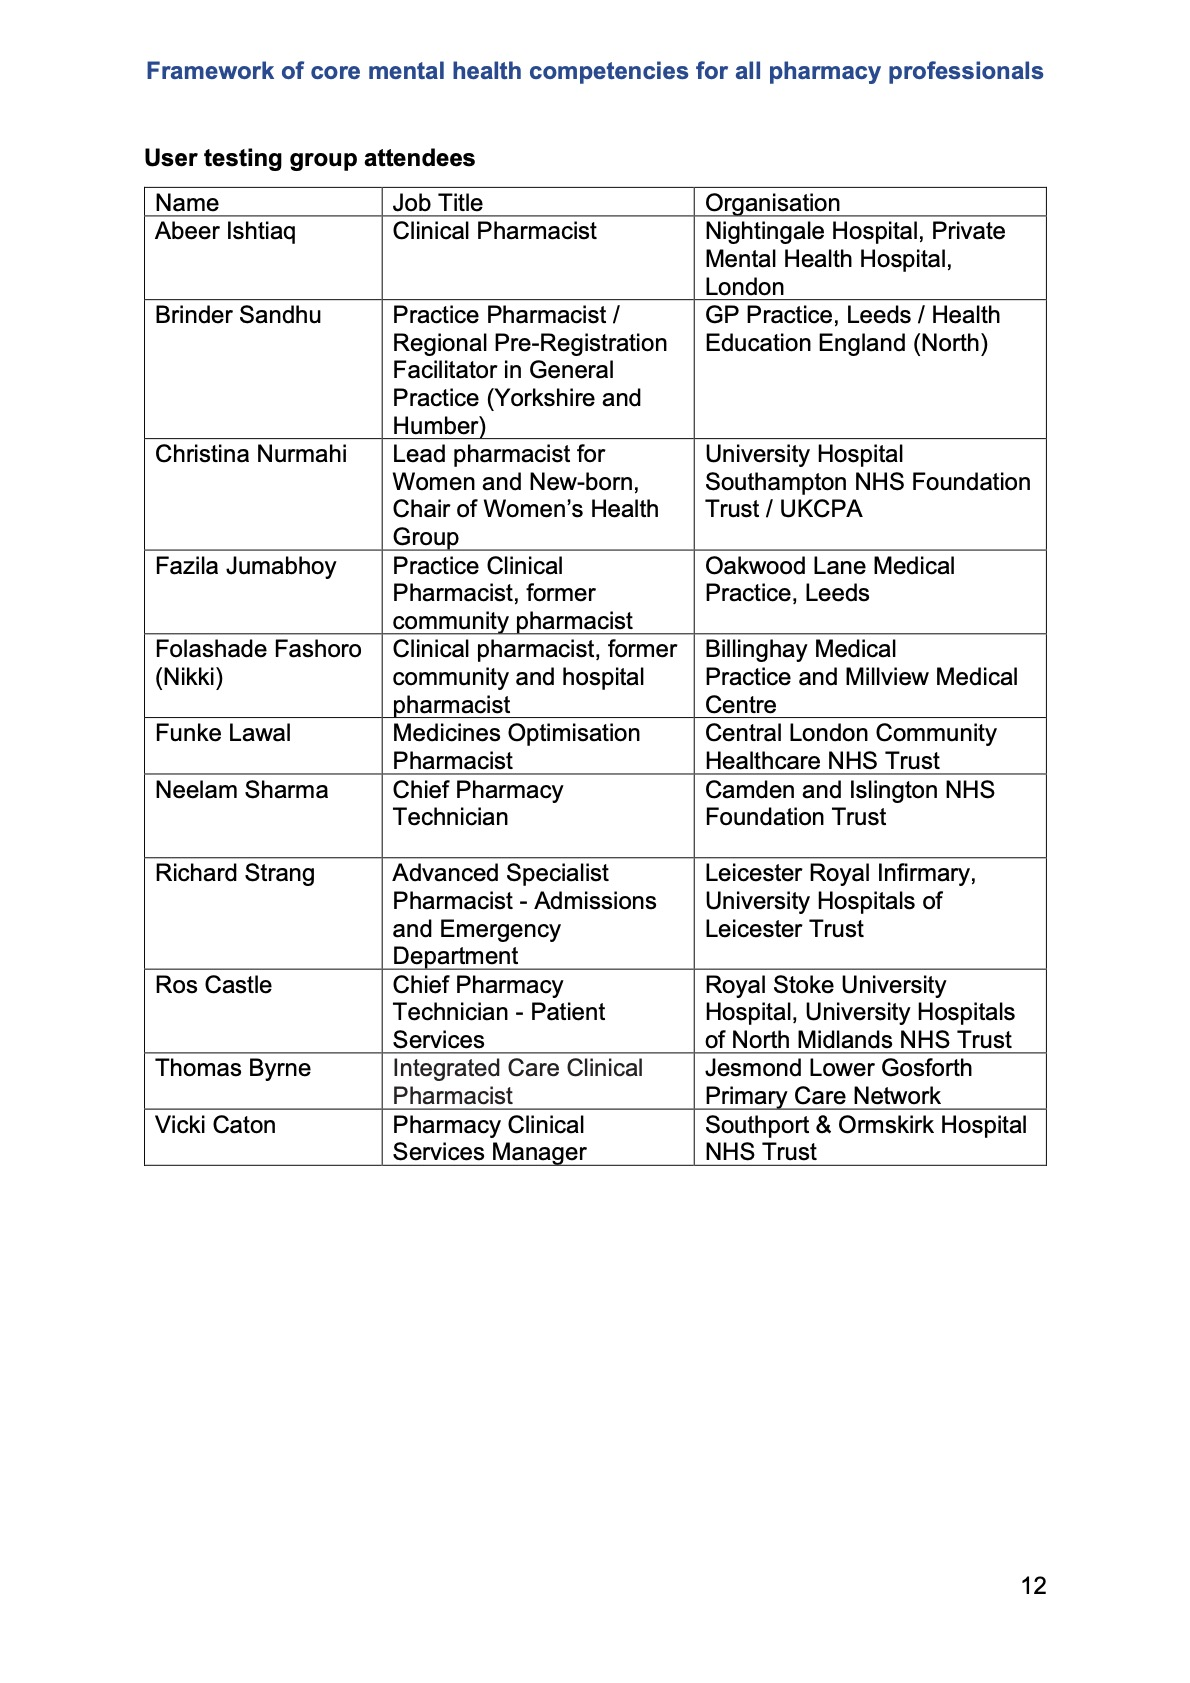 JPEG 12 Pharmacy Framework 2020 (2)